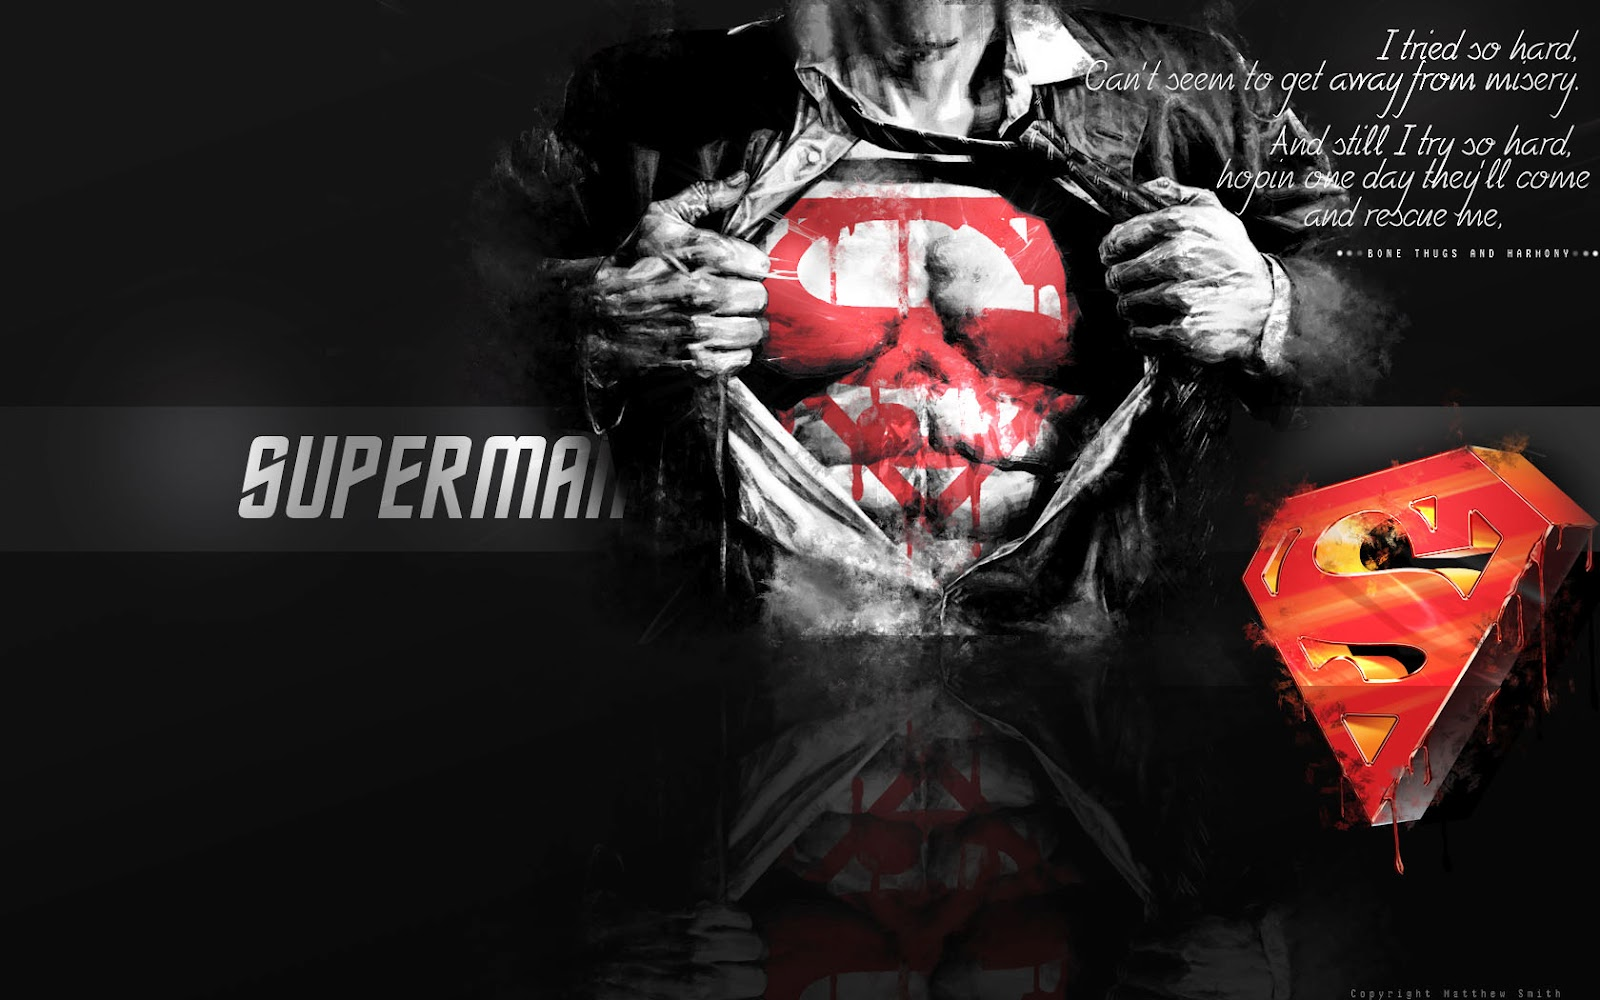 http://3.bp.blogspot.com/-7IxhBGwbO0s/T1jgZ6y98TI/AAAAAAAABUY/kXNOpeC-bLc/s1600/Superman_Wallpaper_by_Unique2892.jpg